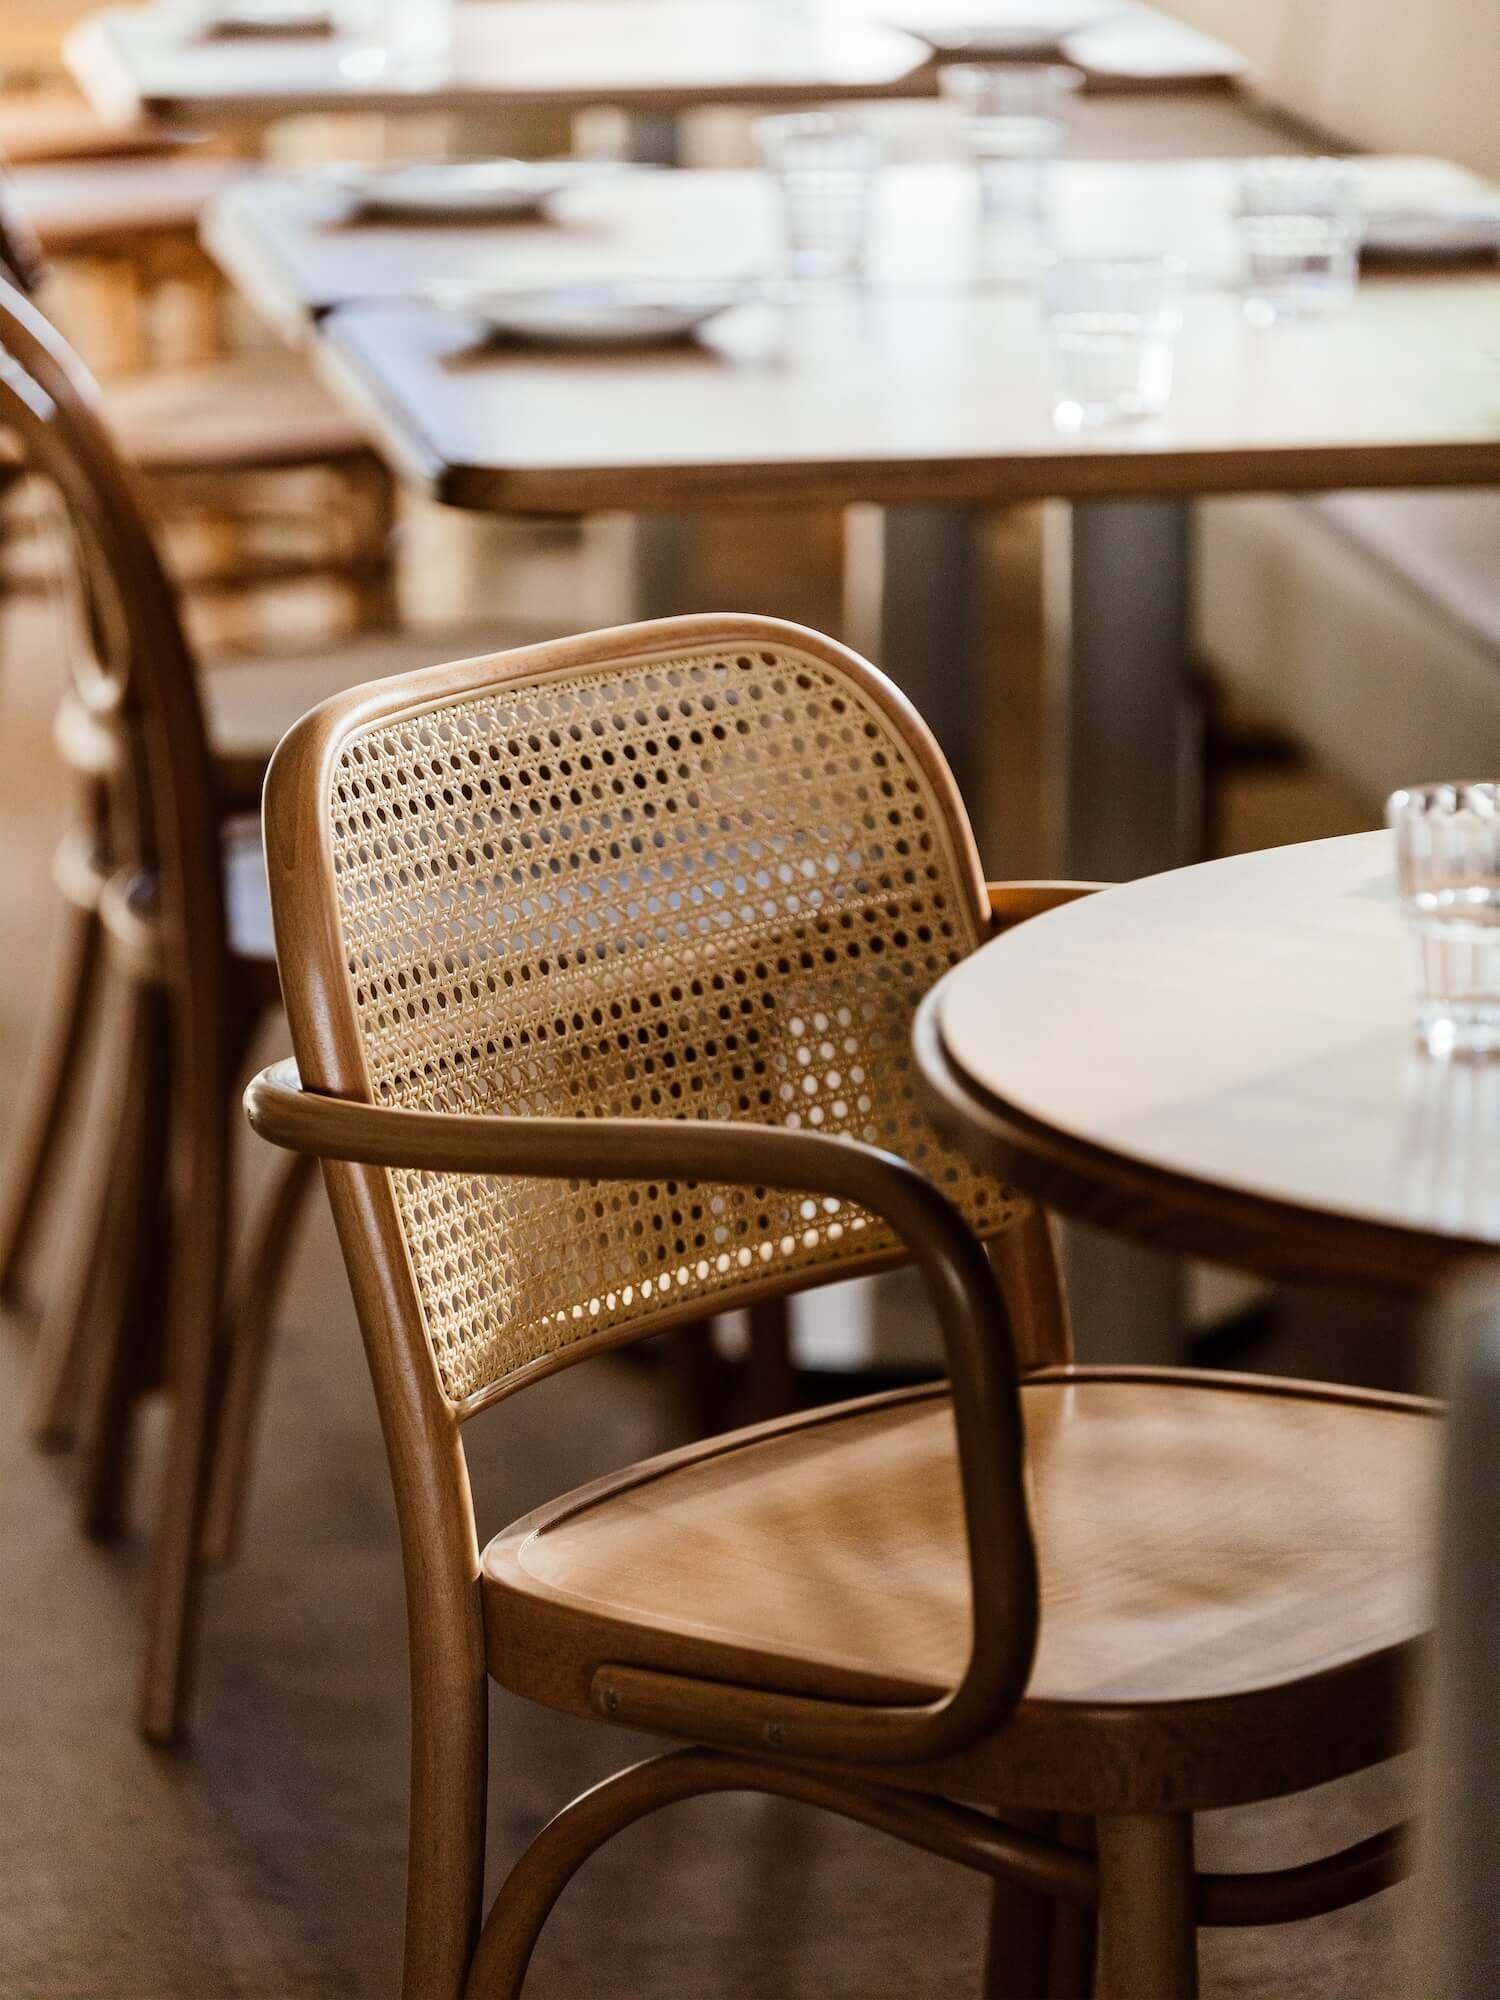 Sisterhood Restaurant By Biasol Hospitality Design Restaurant Interior Design Restaurant Chairs